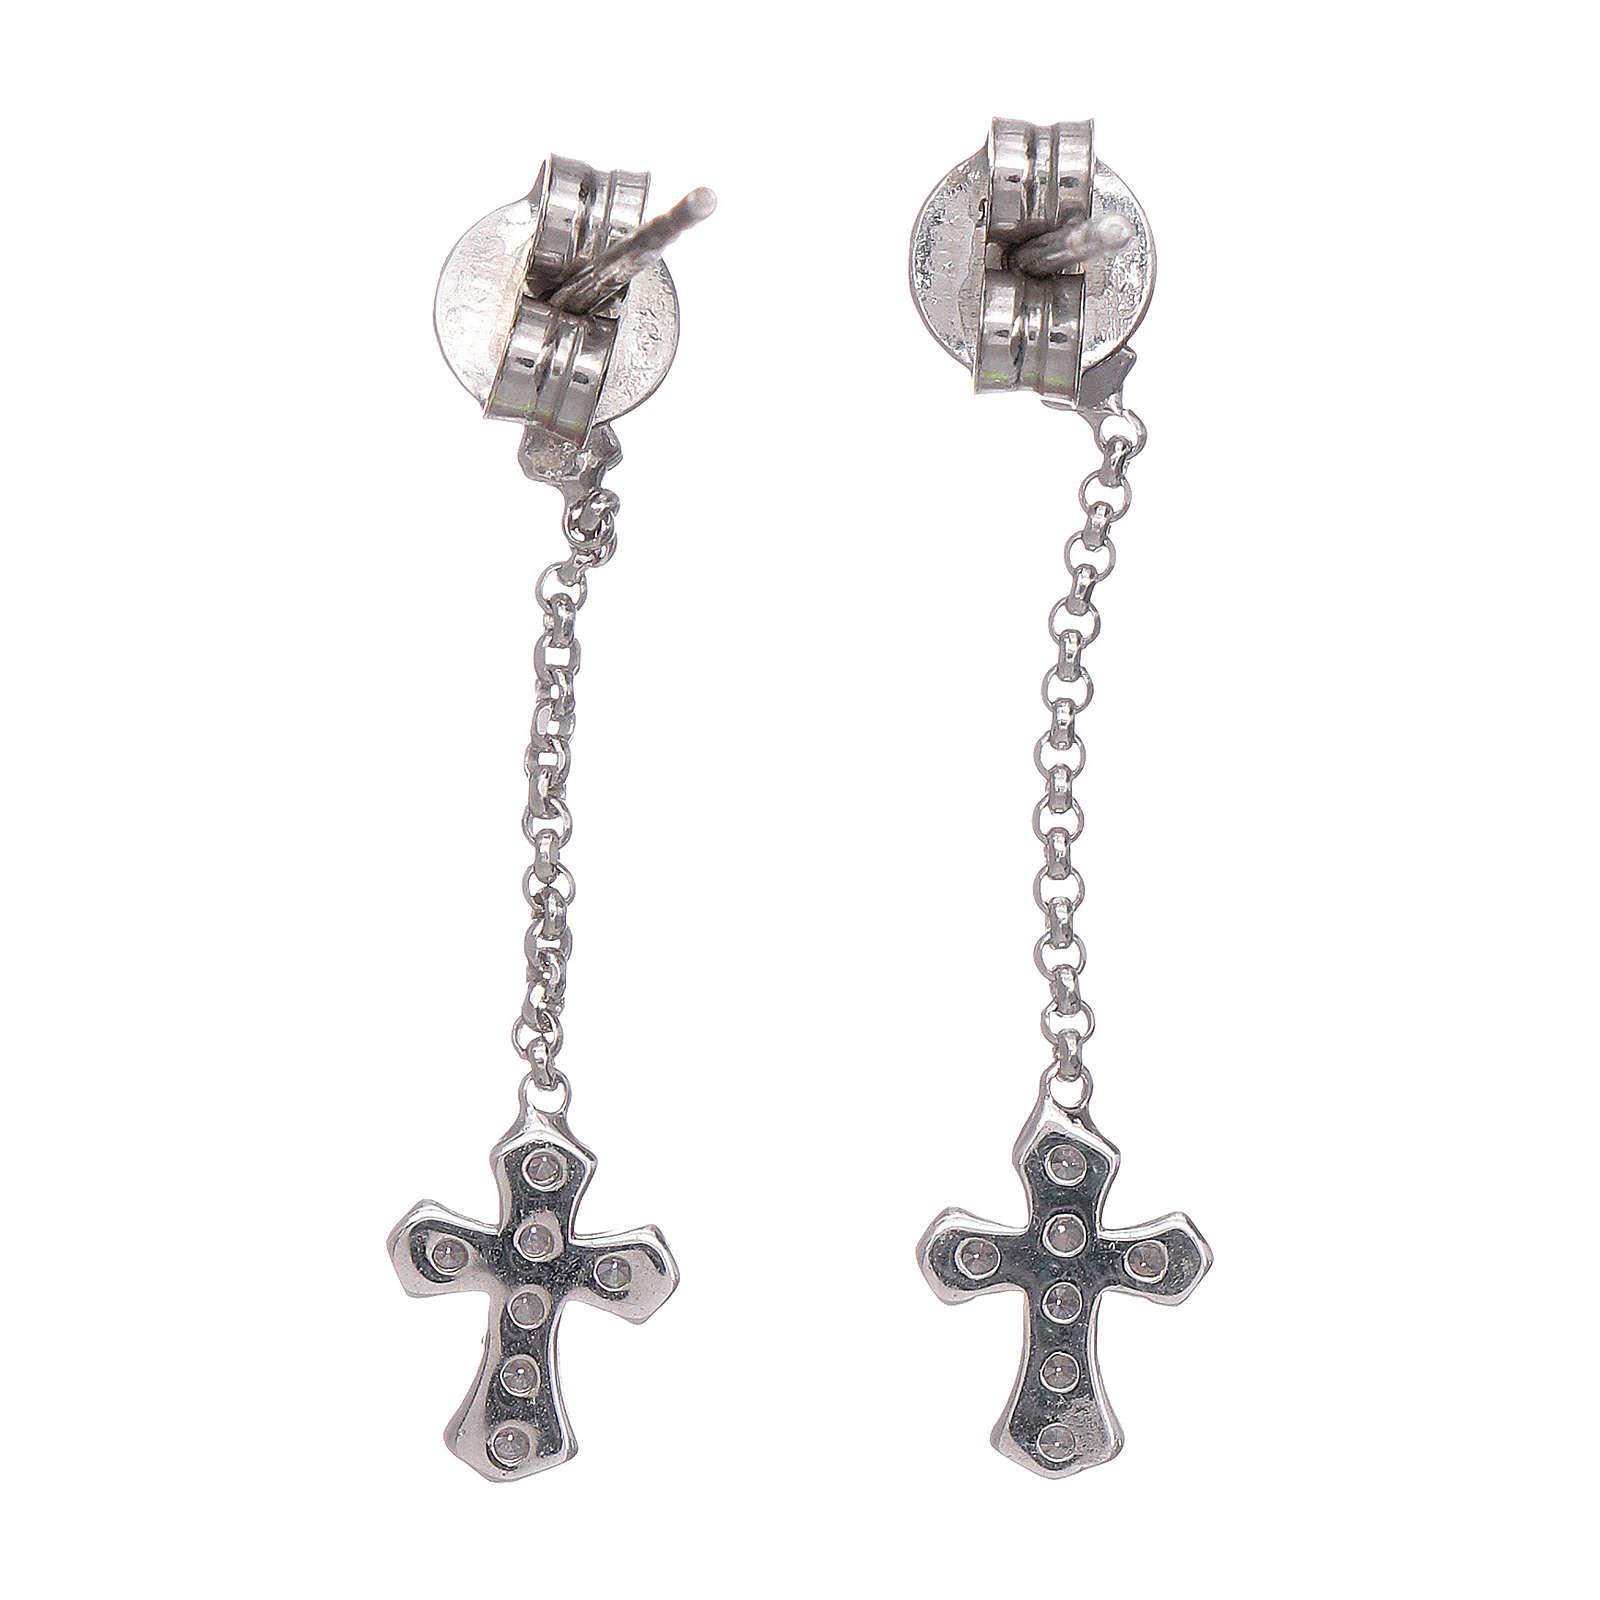 AMEN pendant earrings with zirconate cross in 925 sterling silver finished in rhodium 4